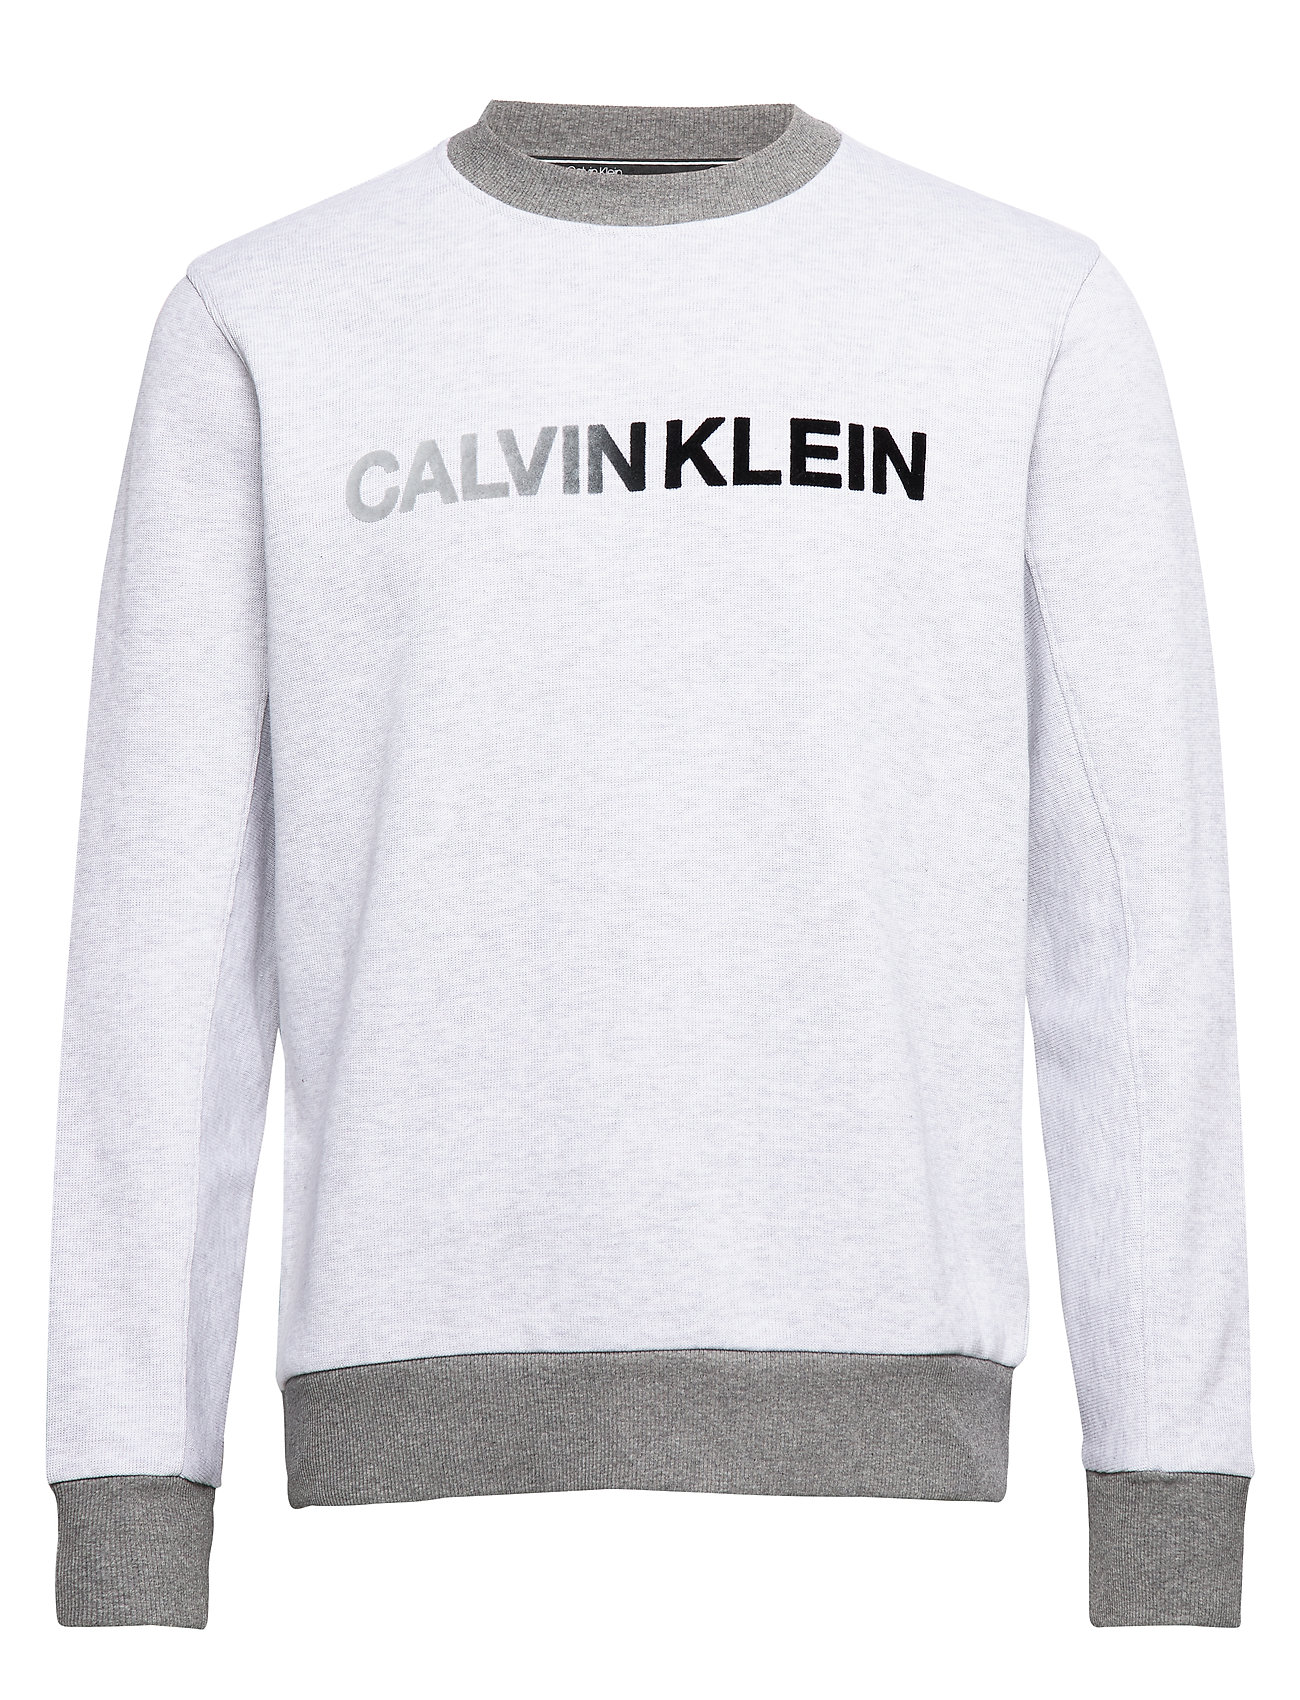 Calvin Klein TONE ON TONE LOGO SWEATSHIRT - LIGHT GREY HEATHER